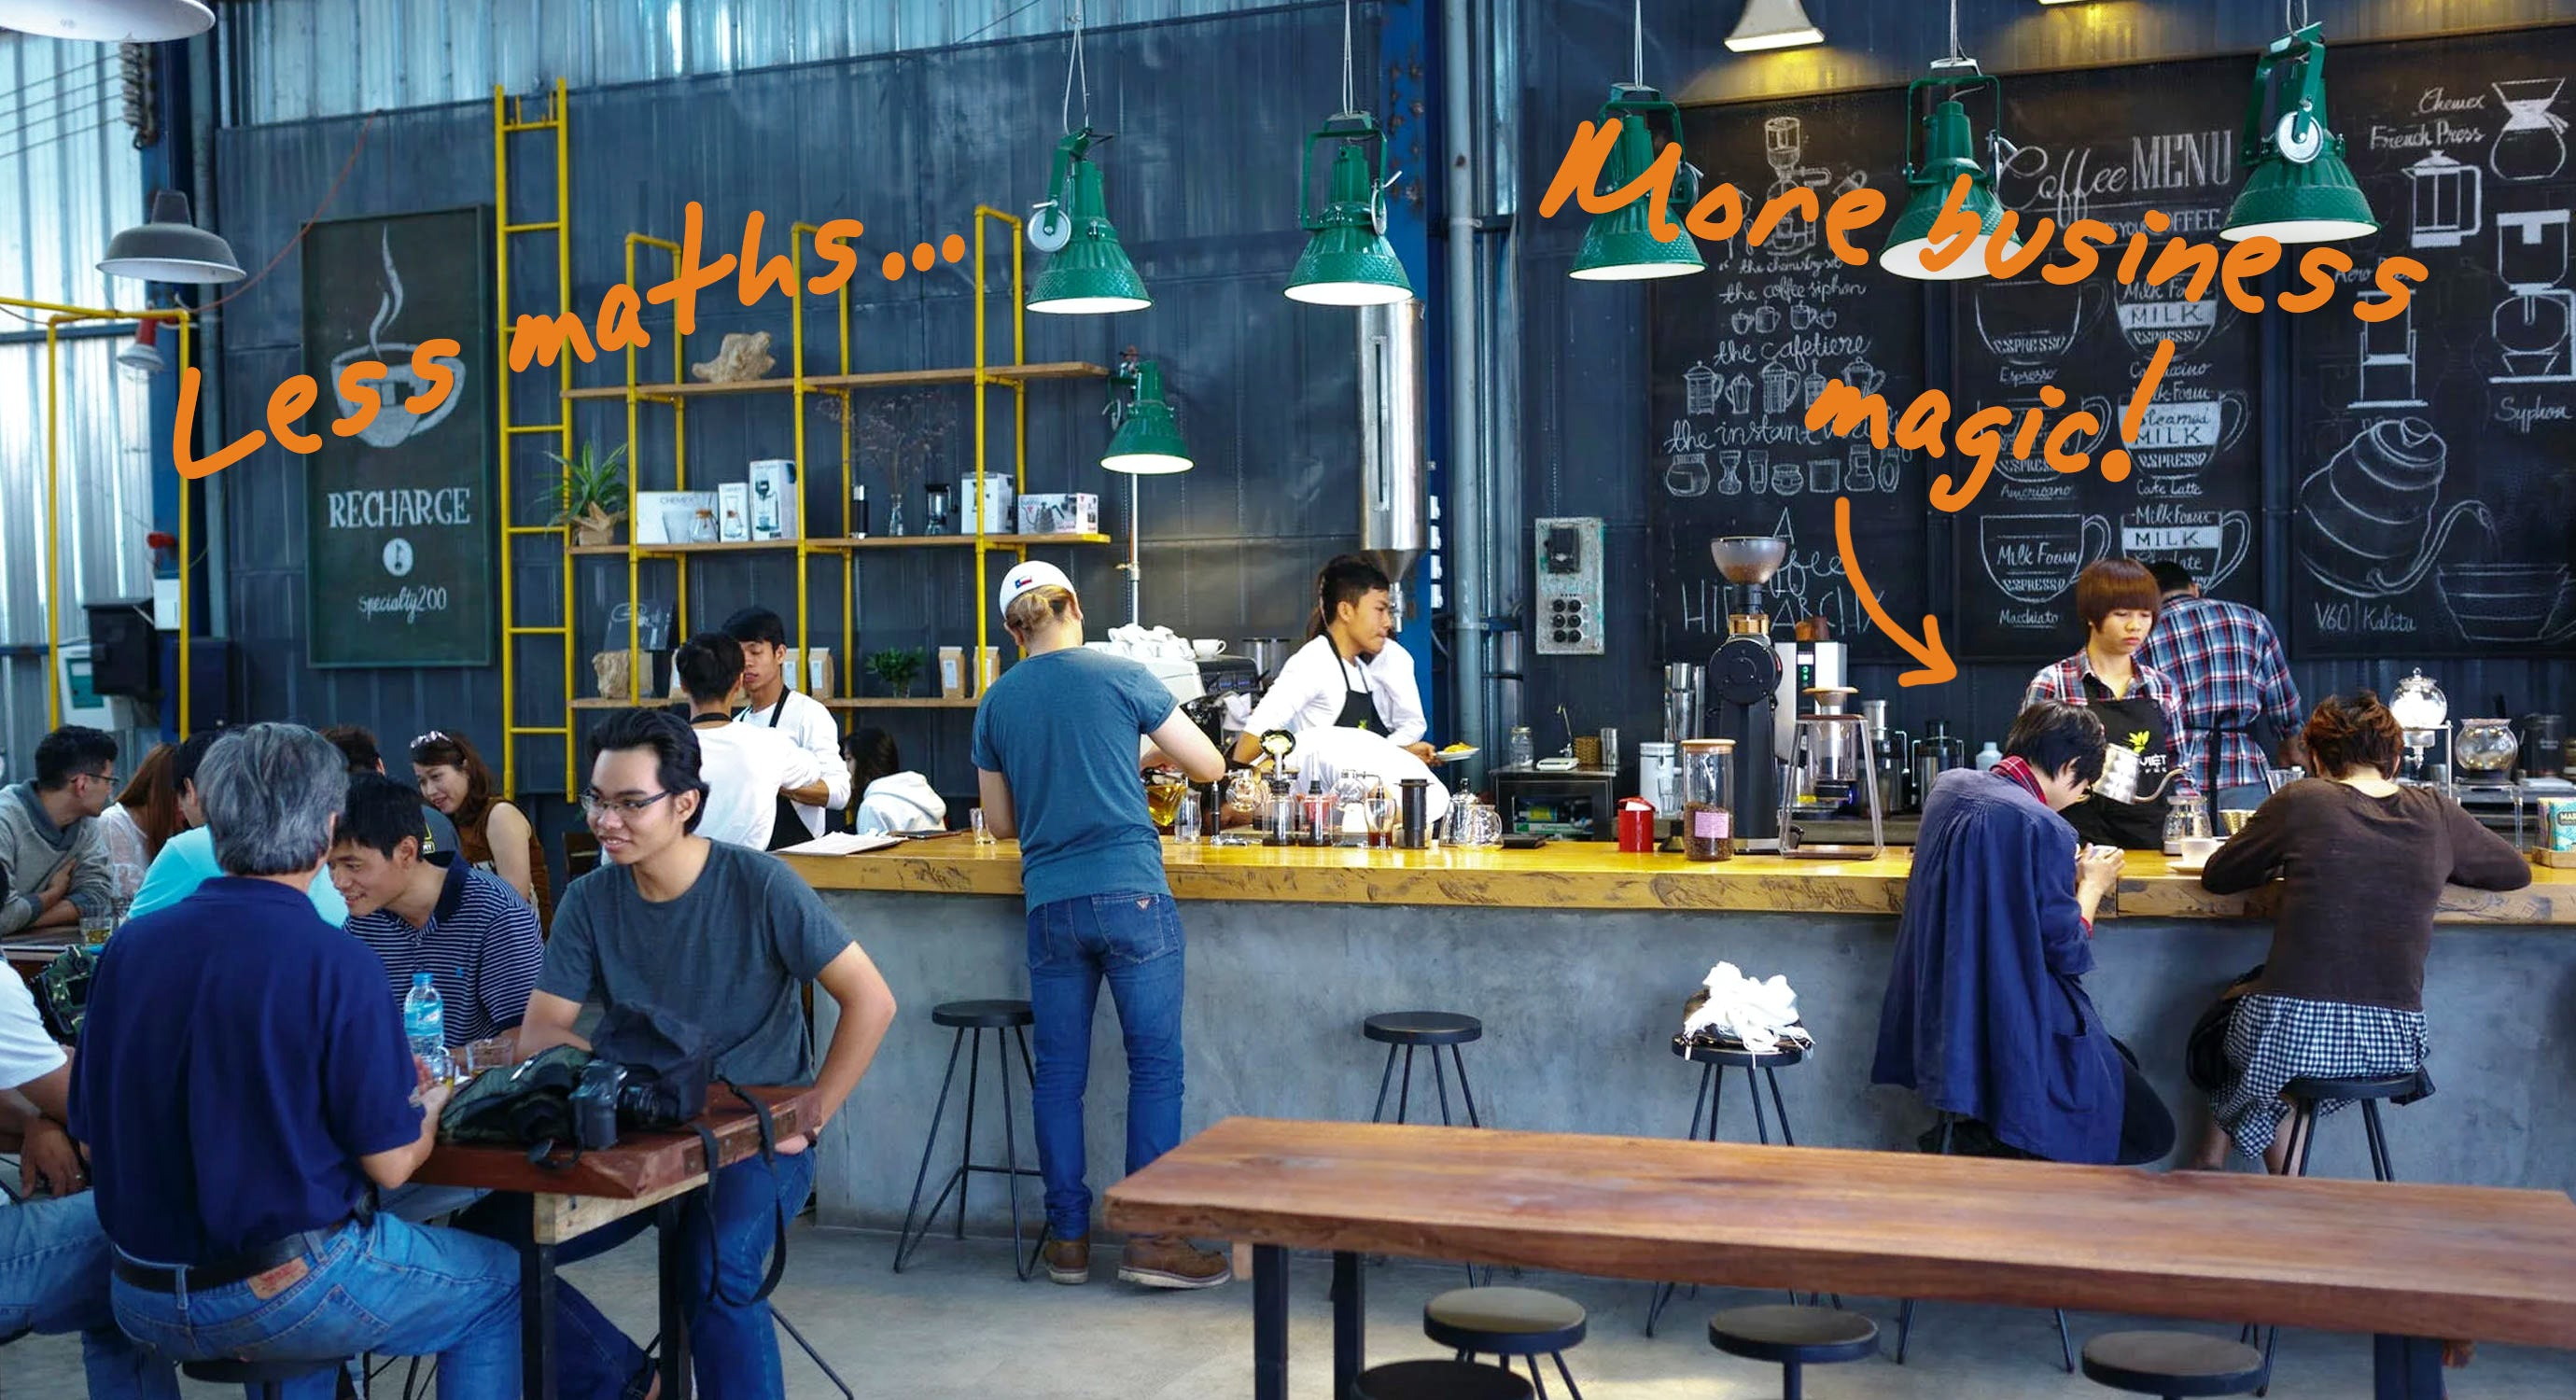 a busy cafe